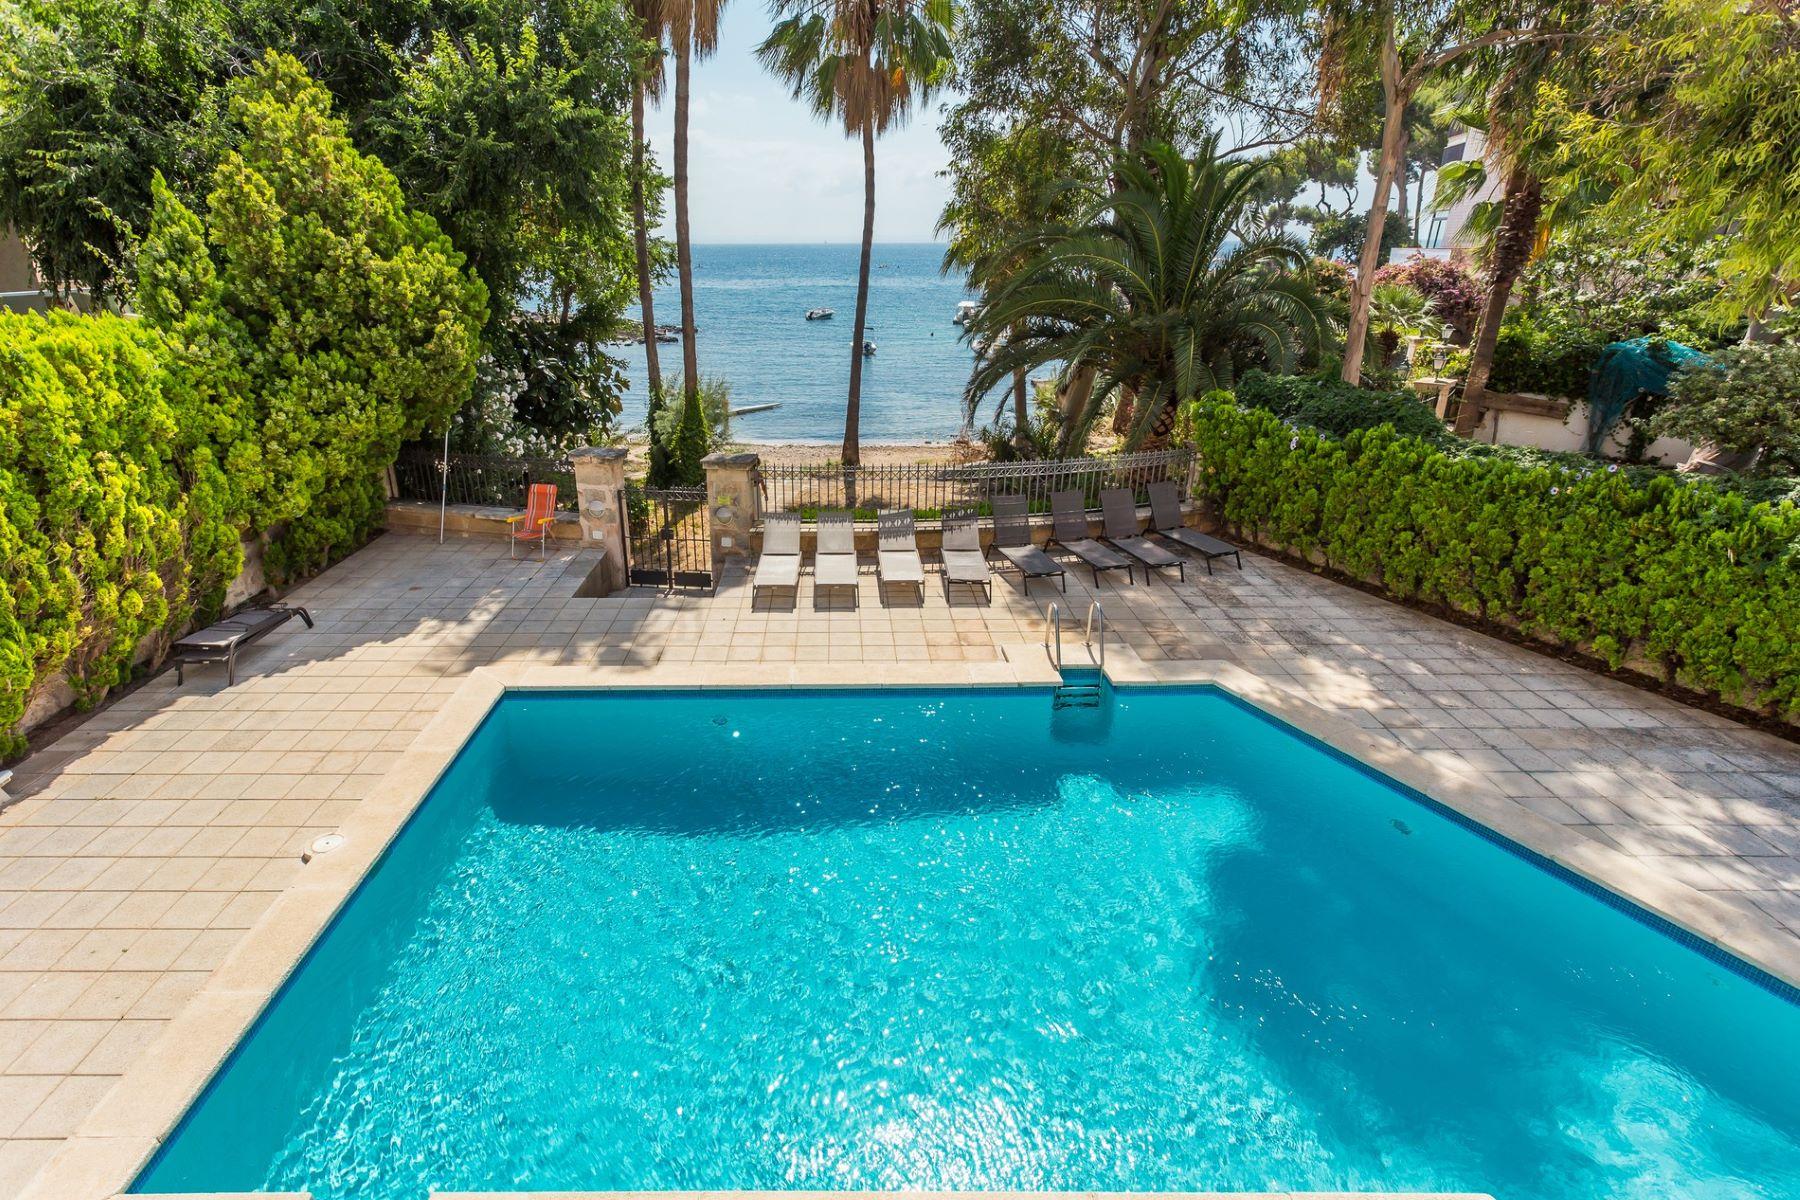 Tek Ailelik Ev için Satış at Beachfront apartment with sea views in Illetas Illetas, Mallorca, Ispanya